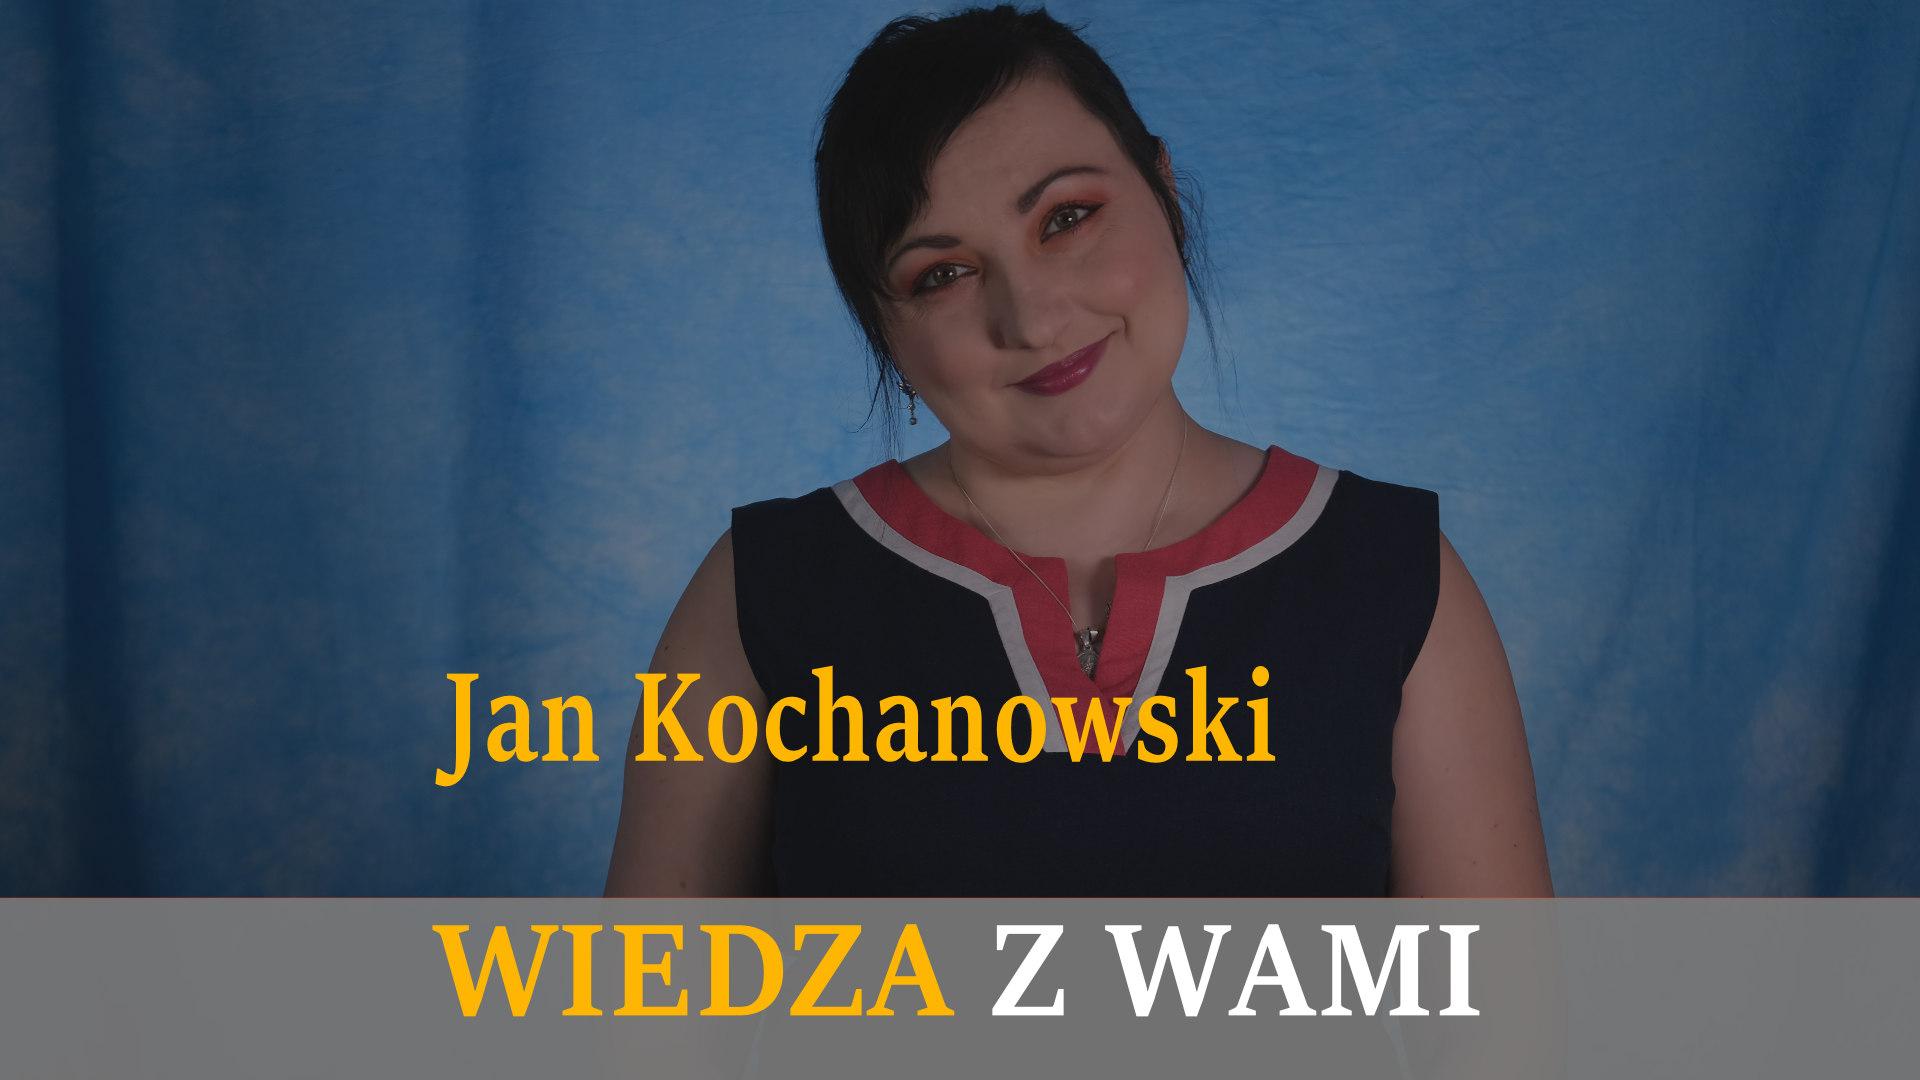 jan kochanowski 2020